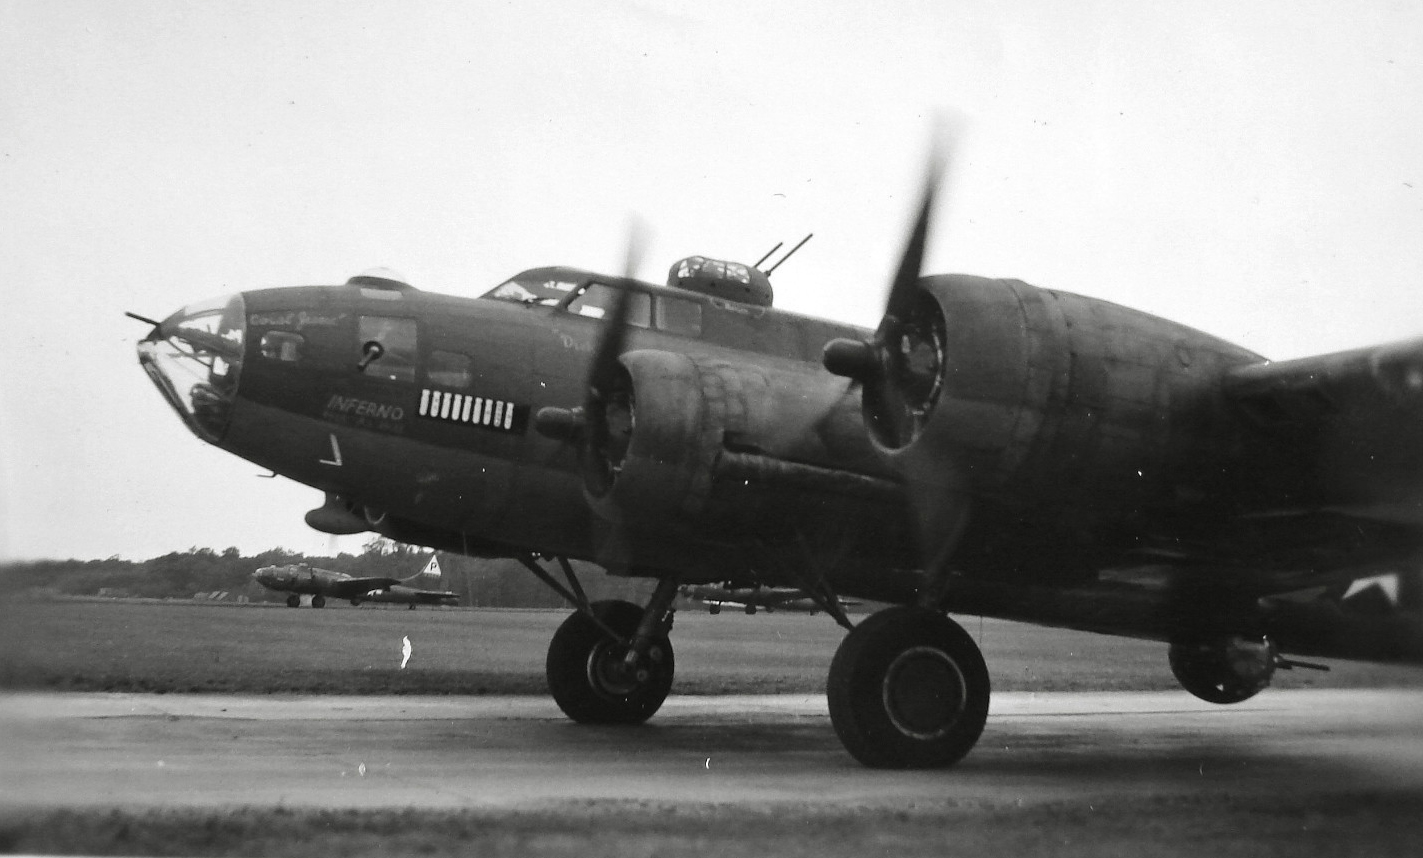 B-17 #42-3231 / The Inferno